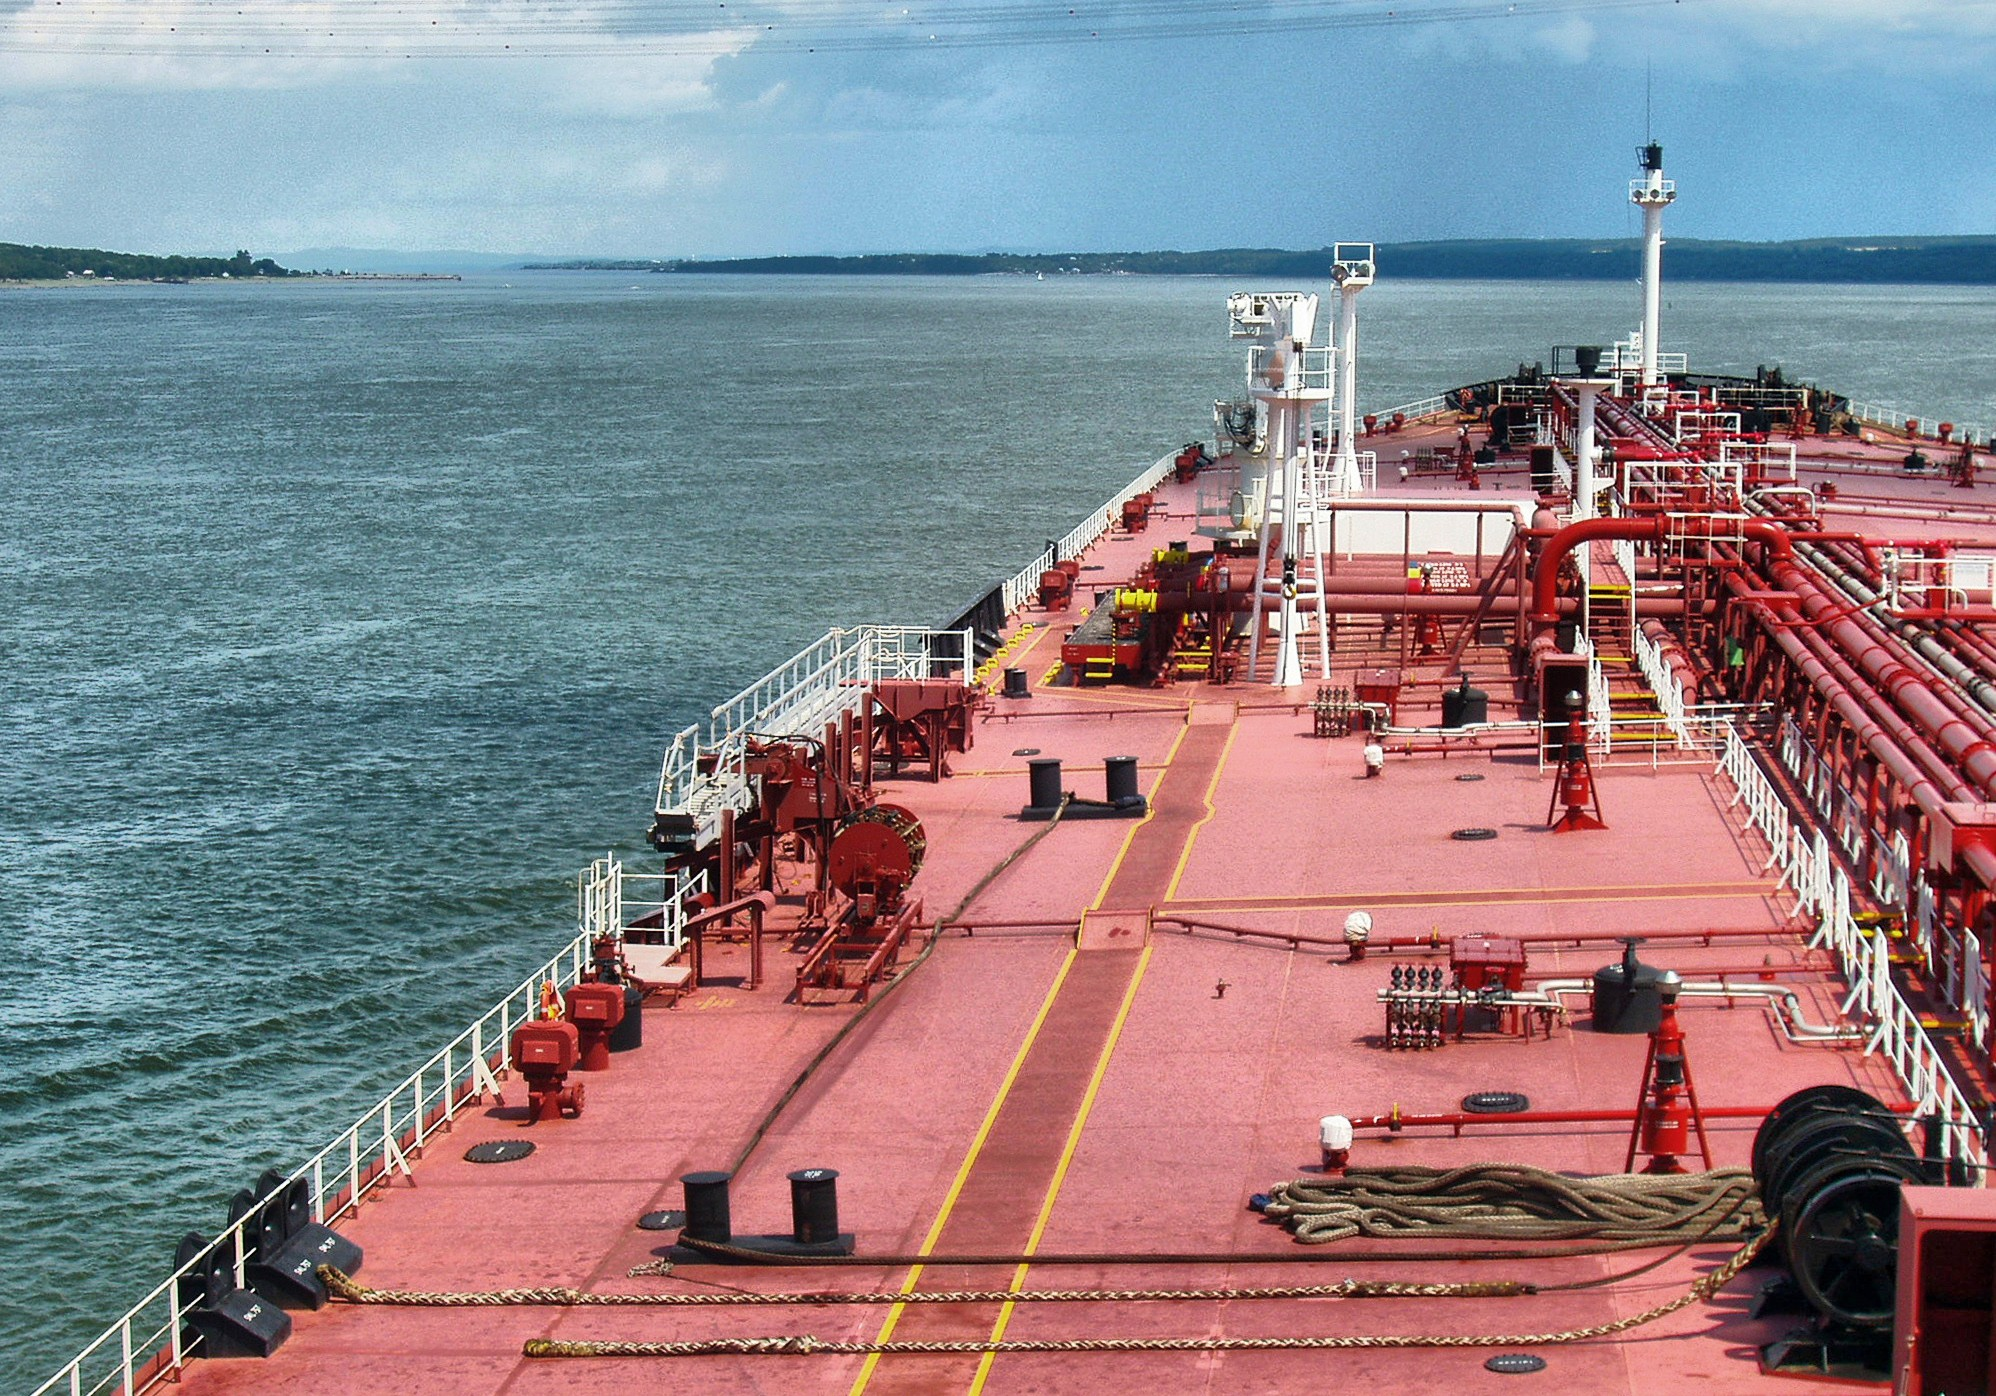 H ελληνική ναυτιλία βασικός μοχλός της ανάπτυξης για την Ελλάδα